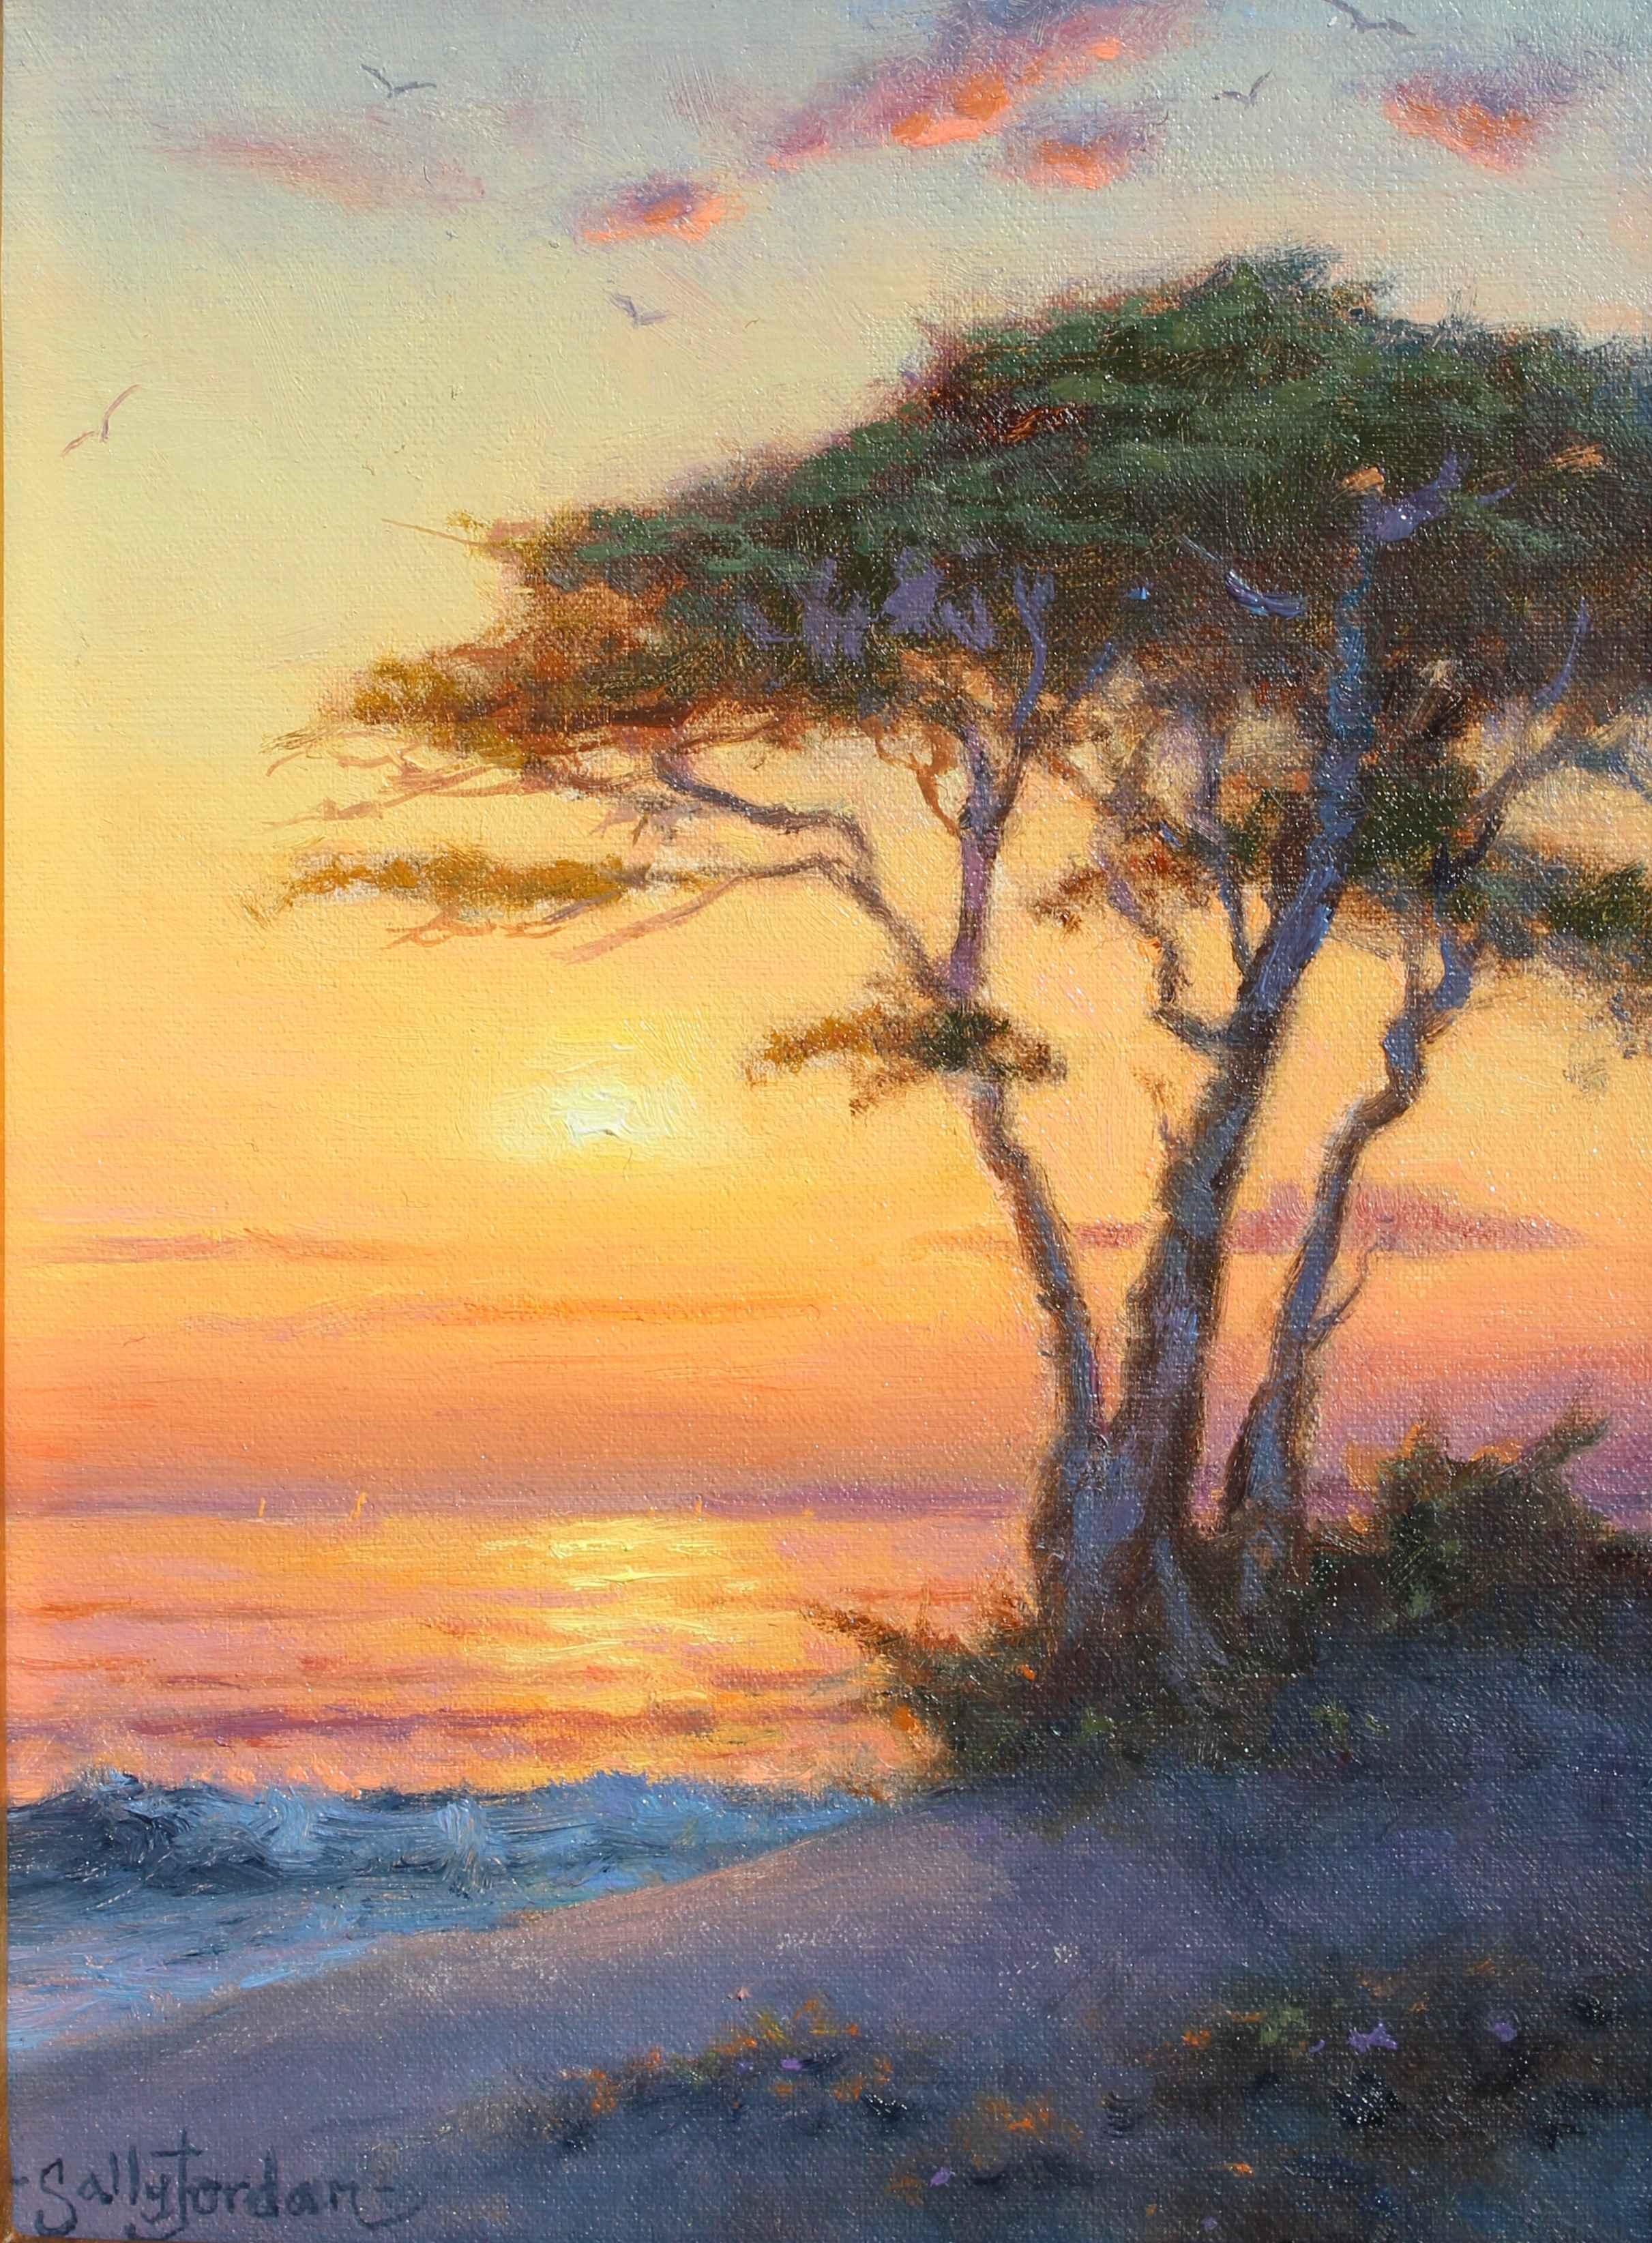 Last Light of Day by  Sally  Jordan - Masterpiece Online